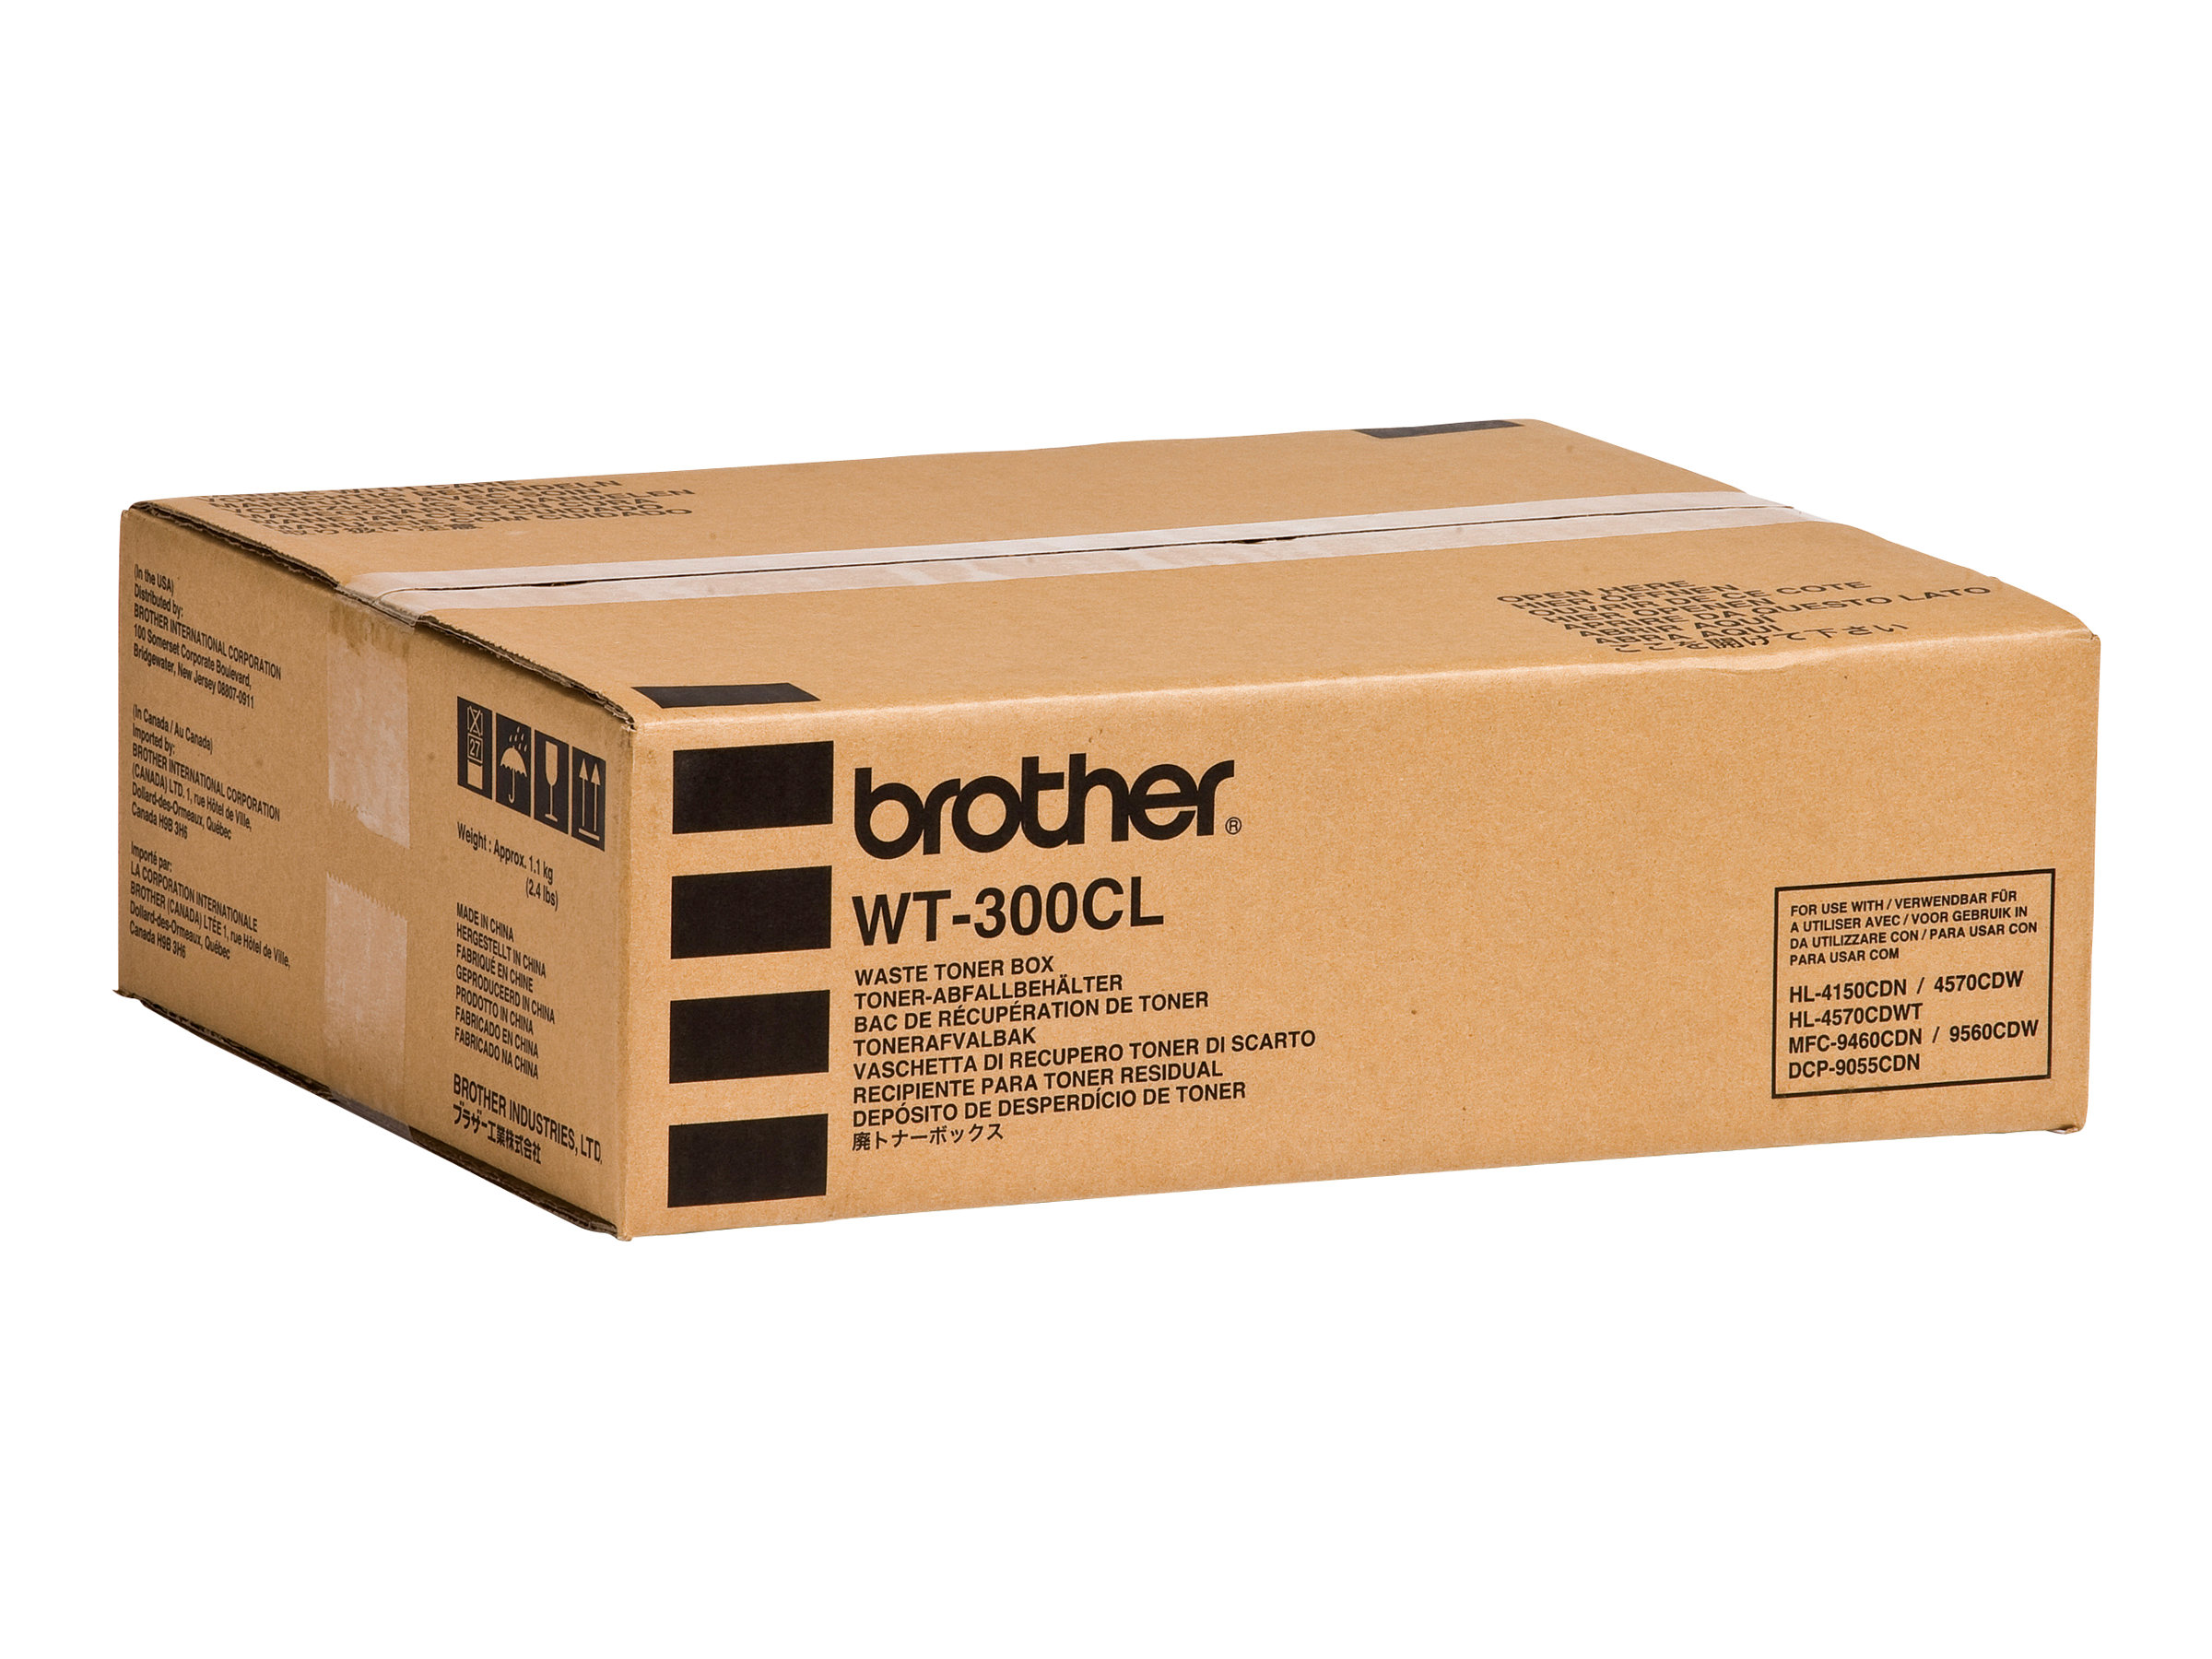 Brother WT300CL - original - collecteur de toner usagé